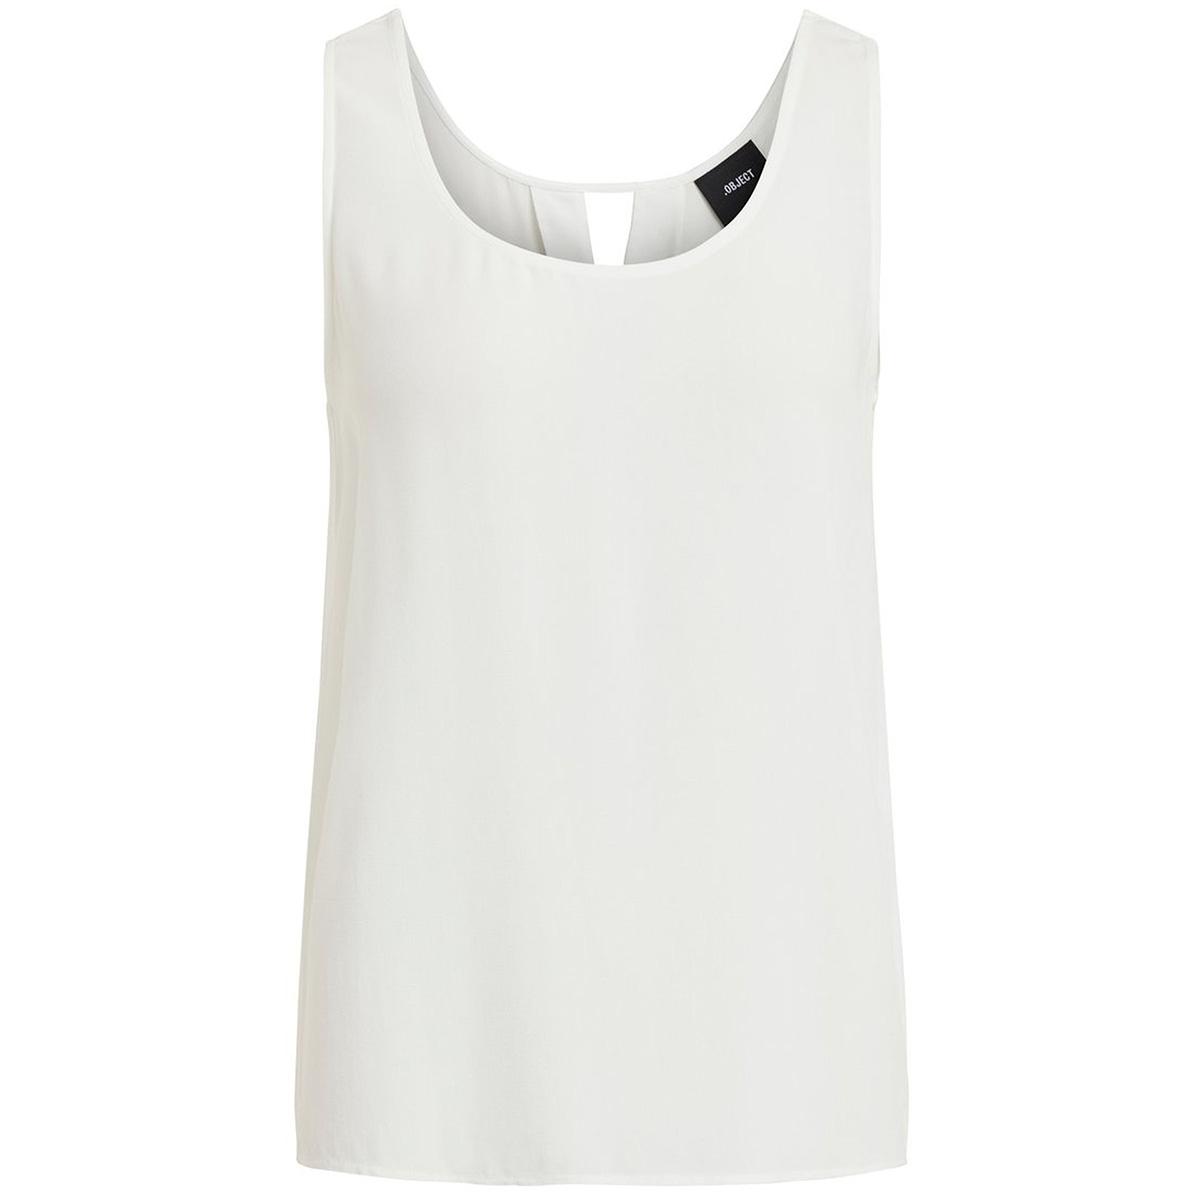 objbay s/l top noos 23028507 object top white